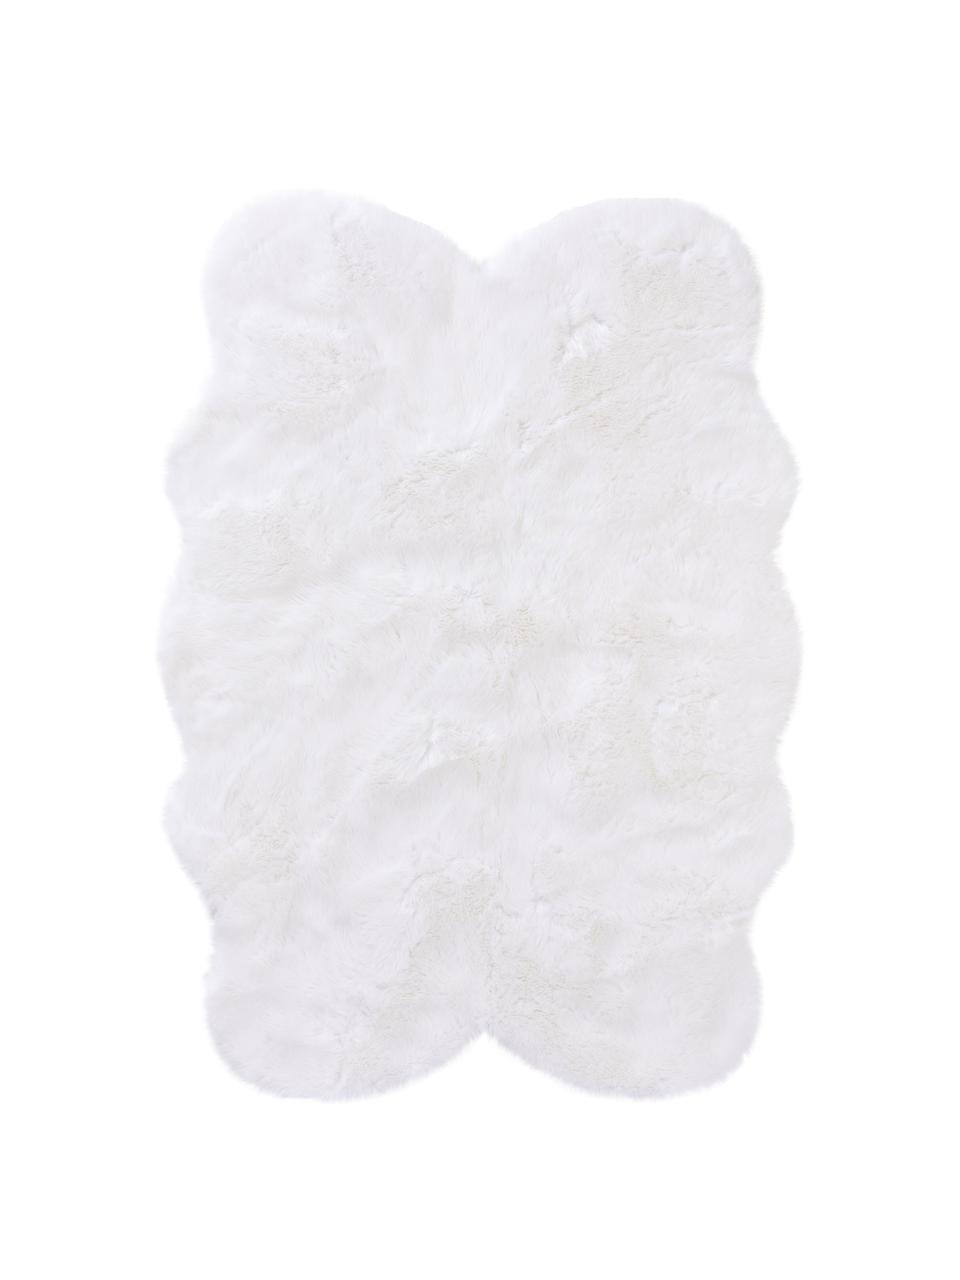 Flauschiger Kunstfell-Teppich Elmo in Weiß, glatt, Flor: 50% Acryl, 50% Polyester, Weiß, B 140 x L 200 cm (Größe S)